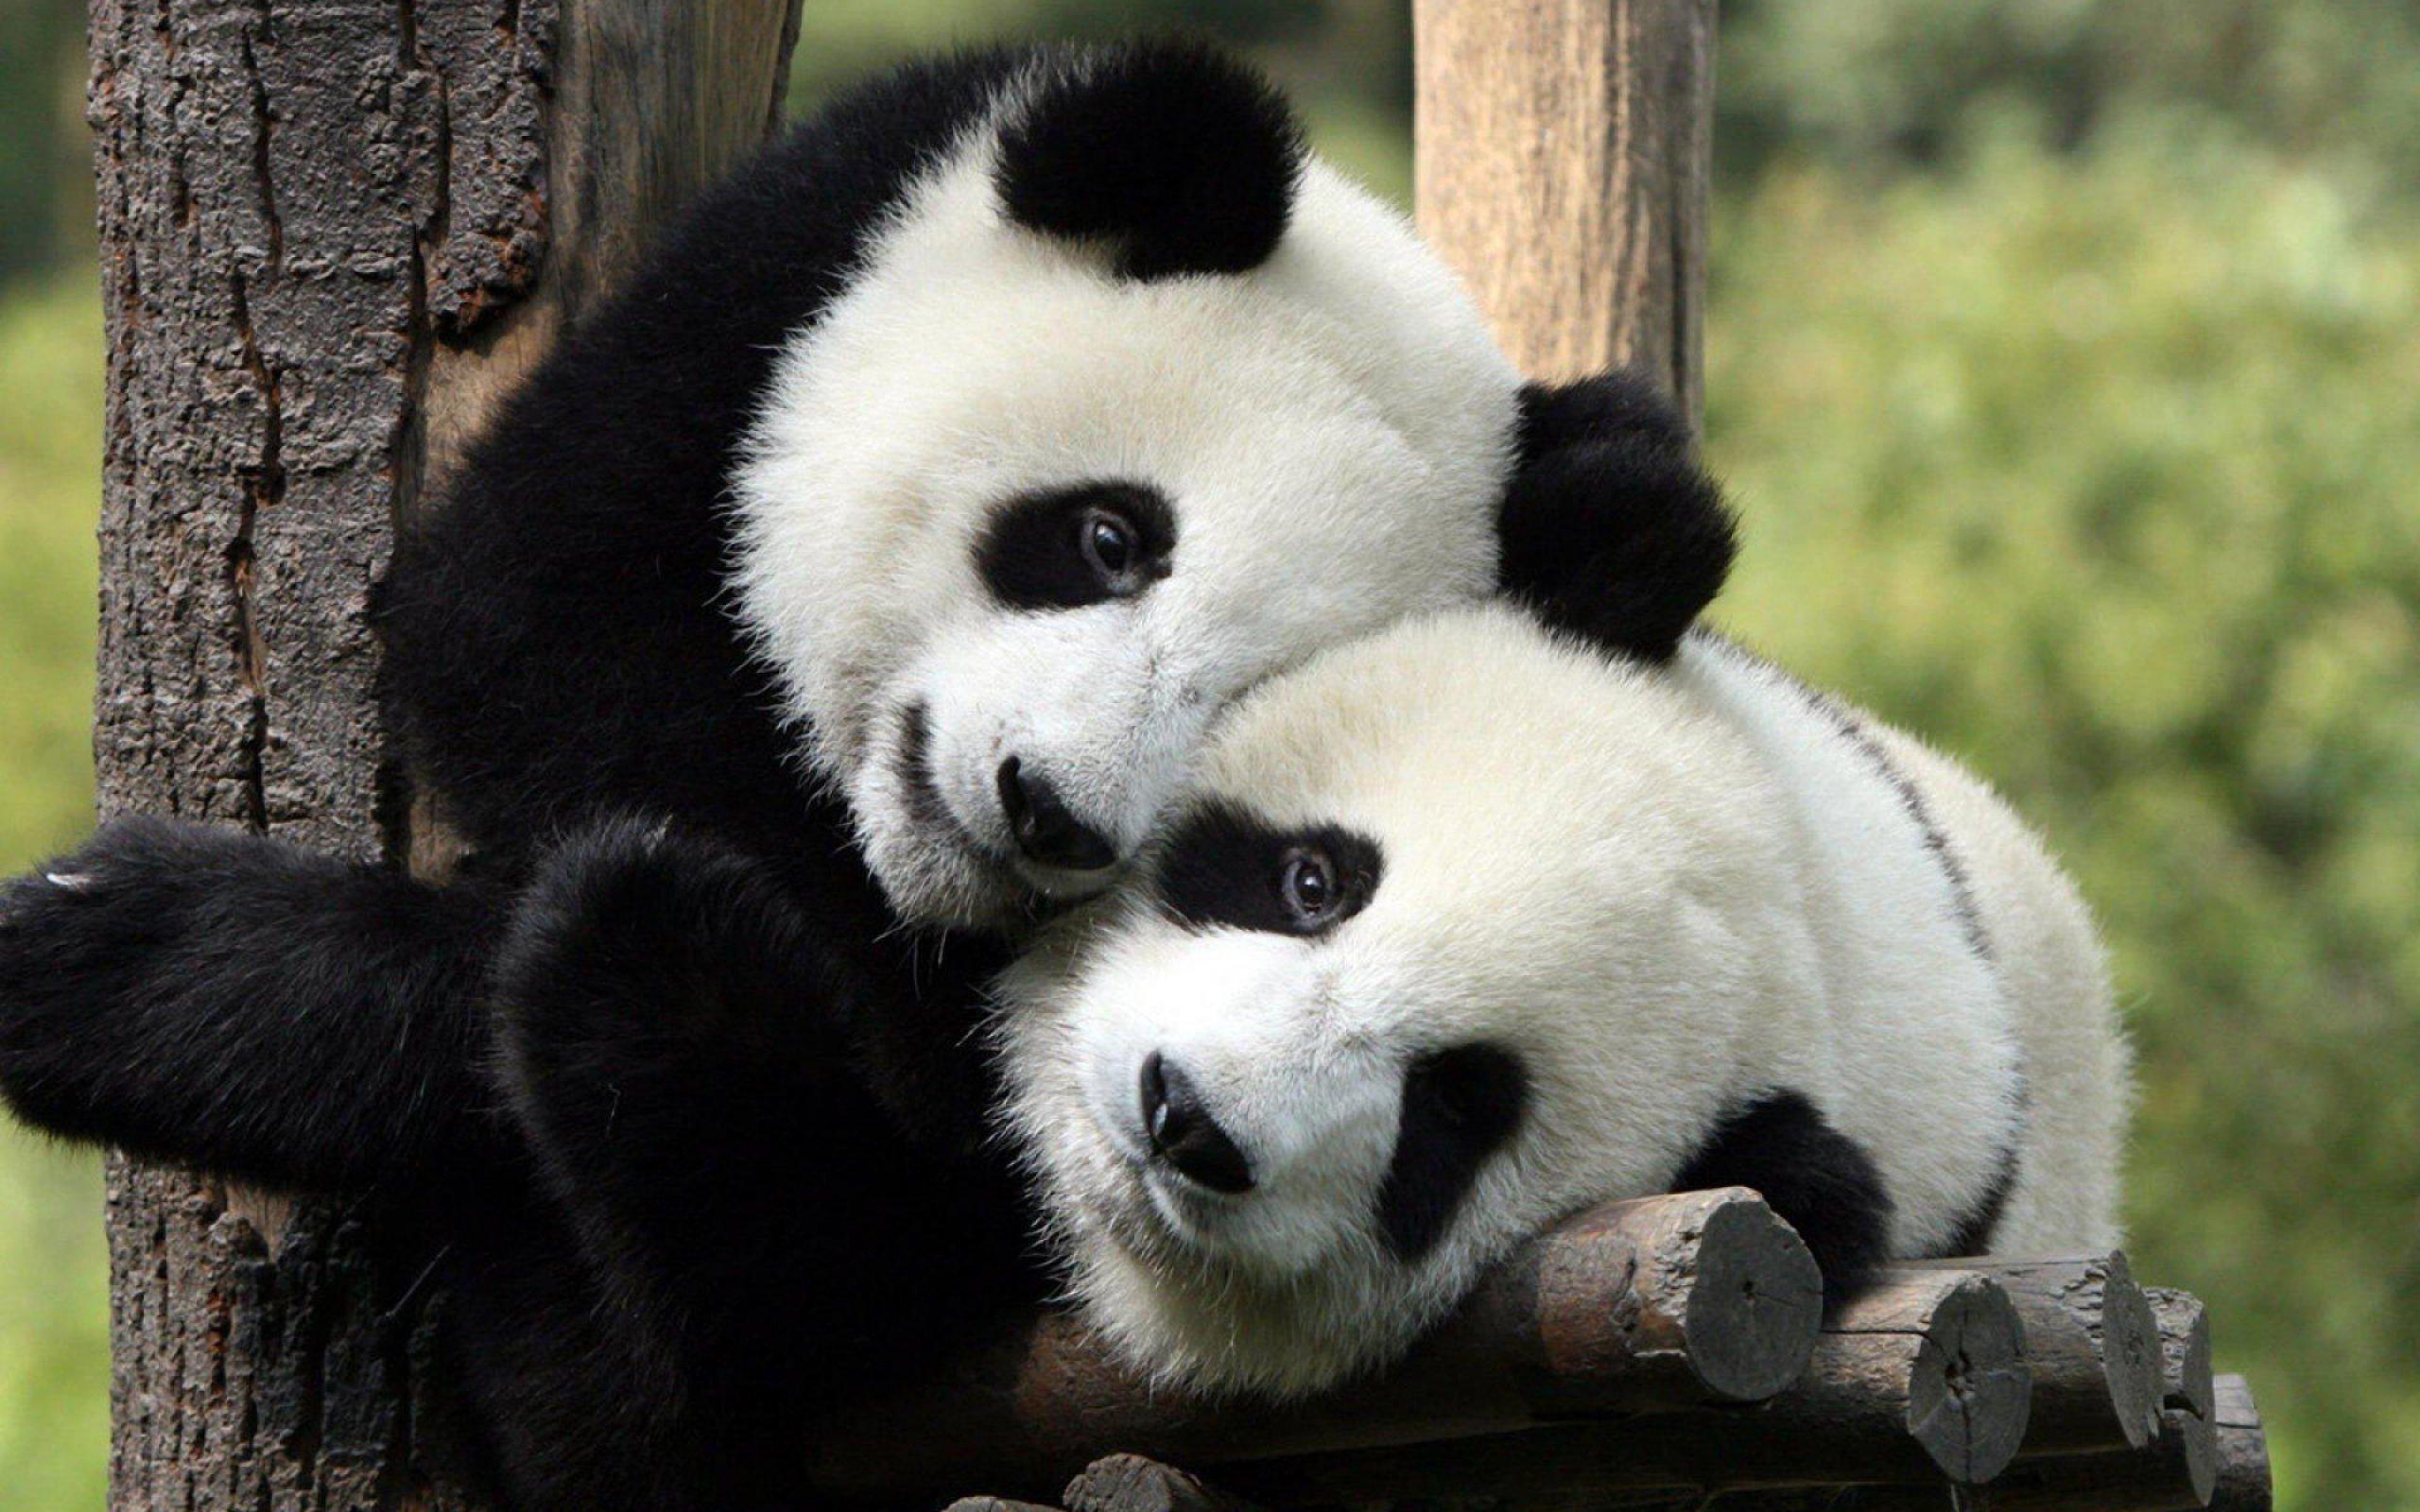 hug, Hugging, Couple, Love, Mood, People, Men, Women, Happy, Panda, Bear Wallpaper